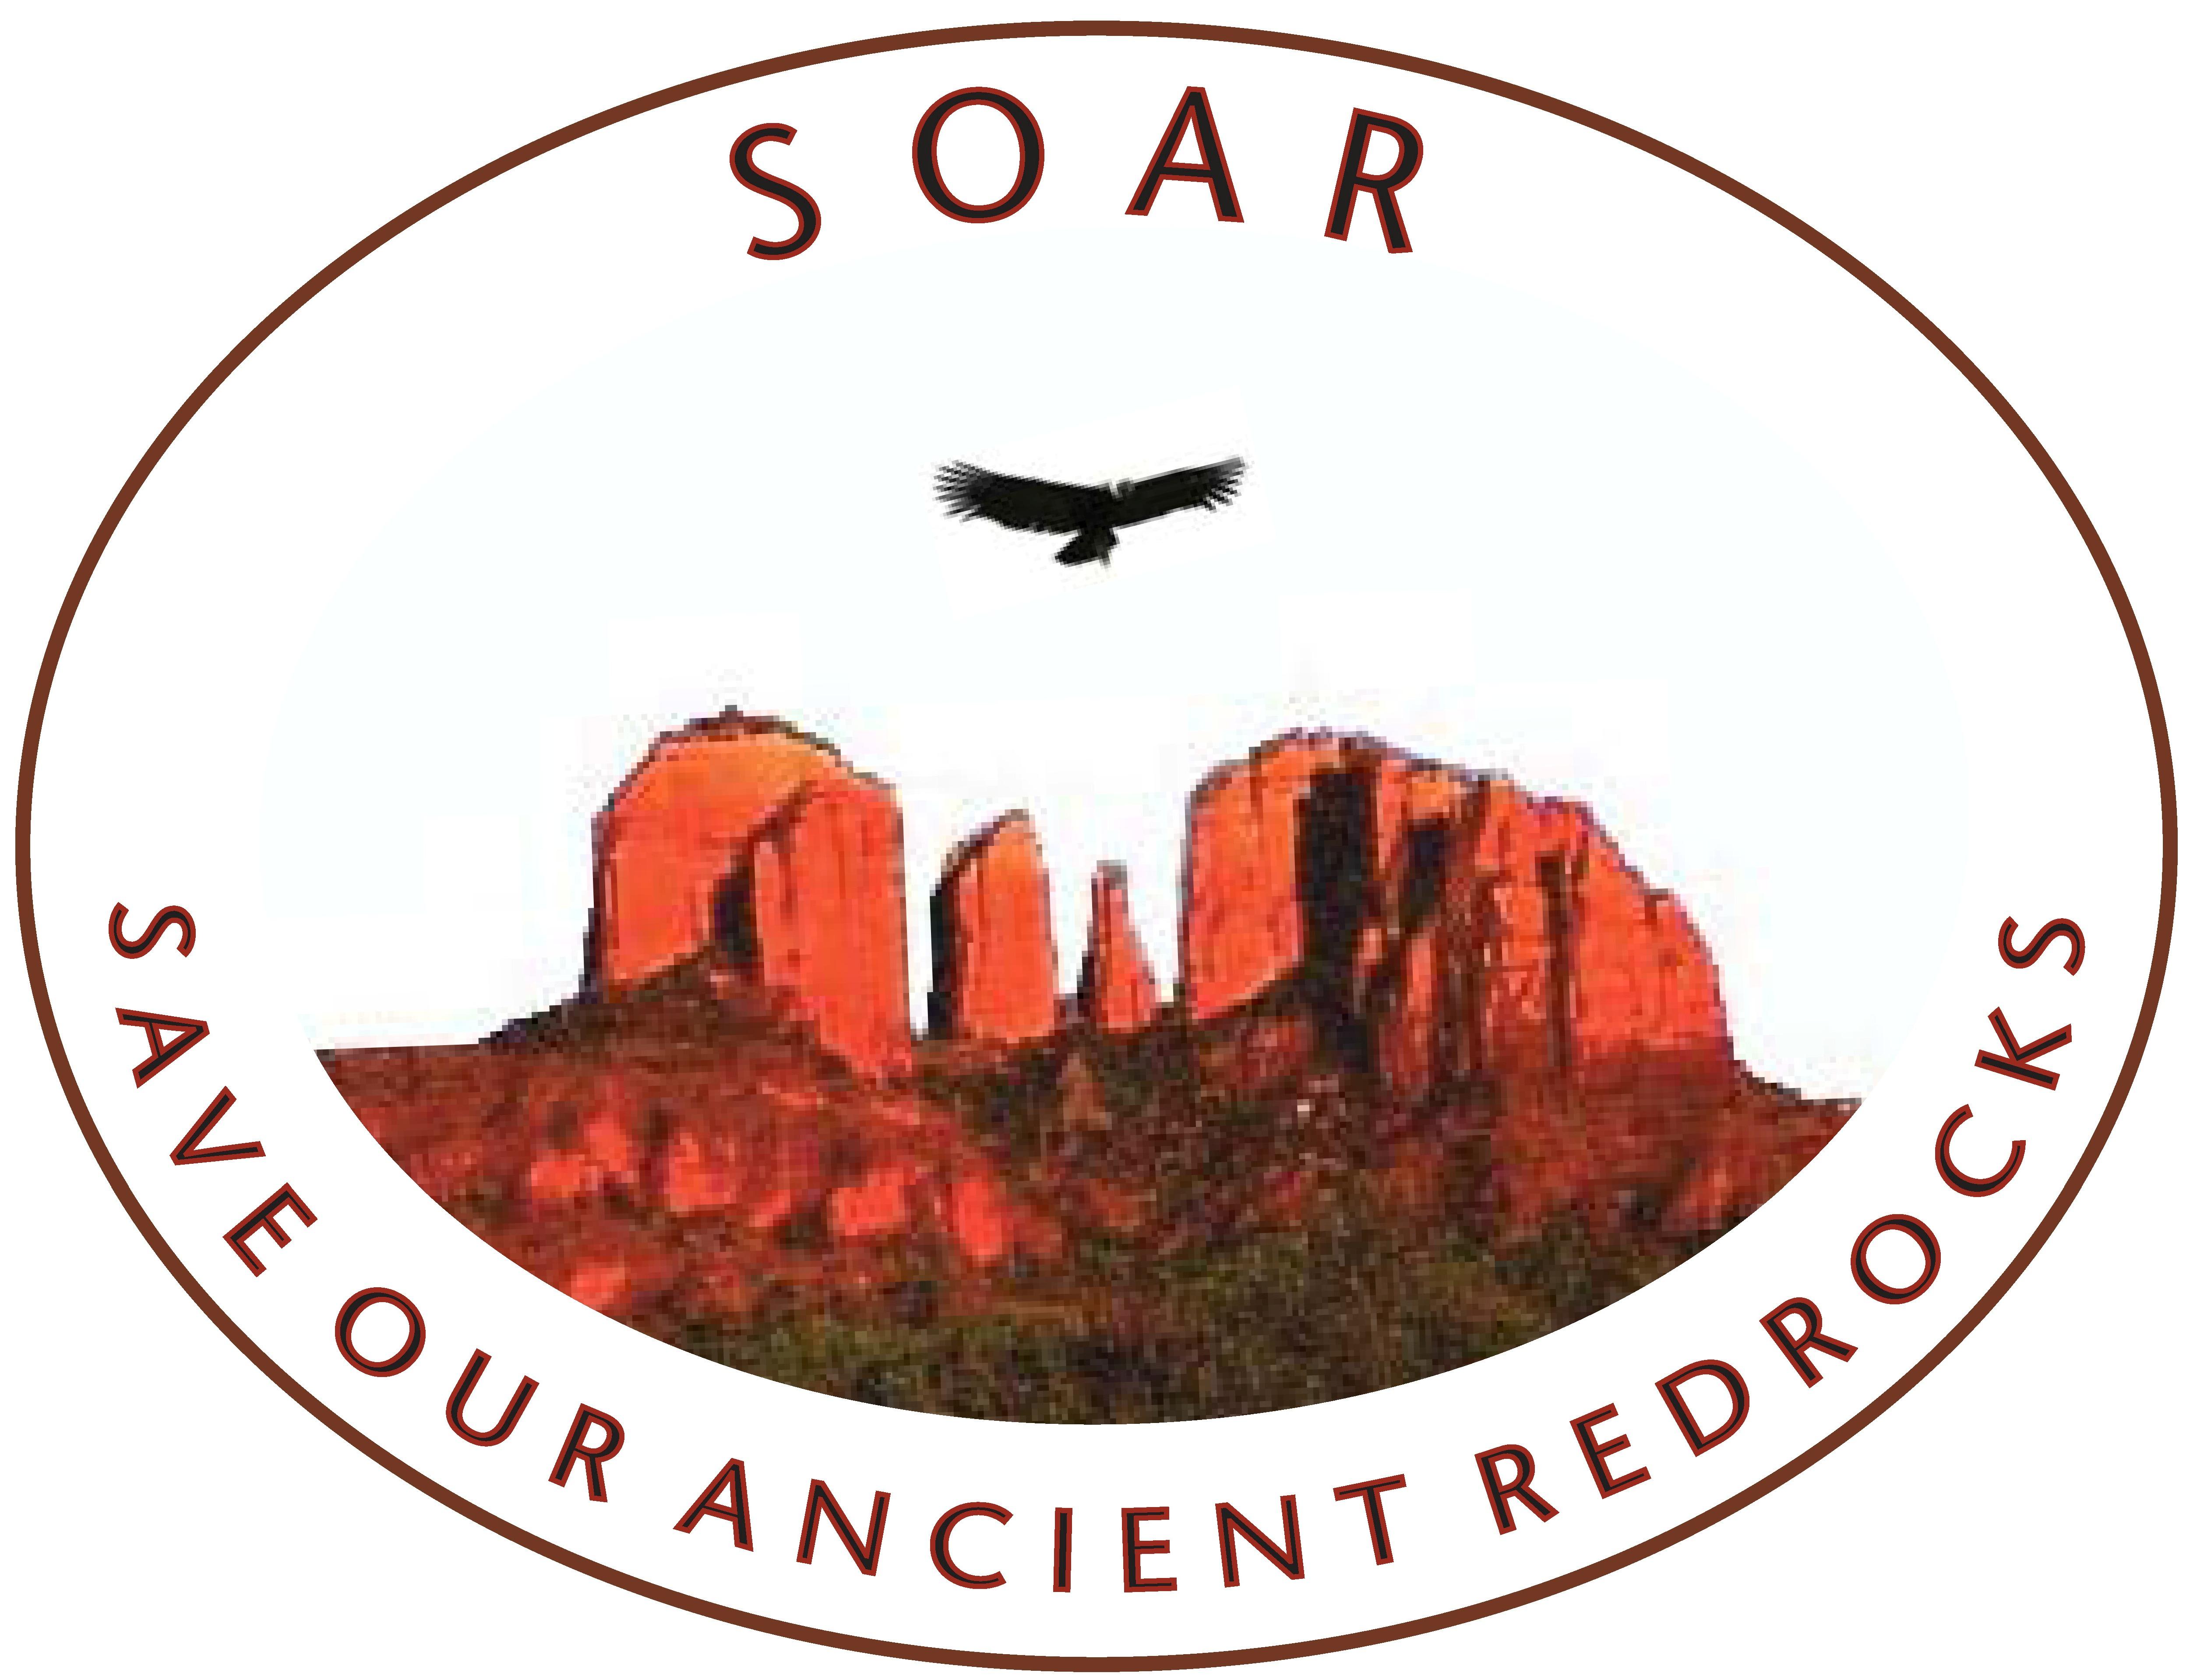 soar logo 3 high res - cropped